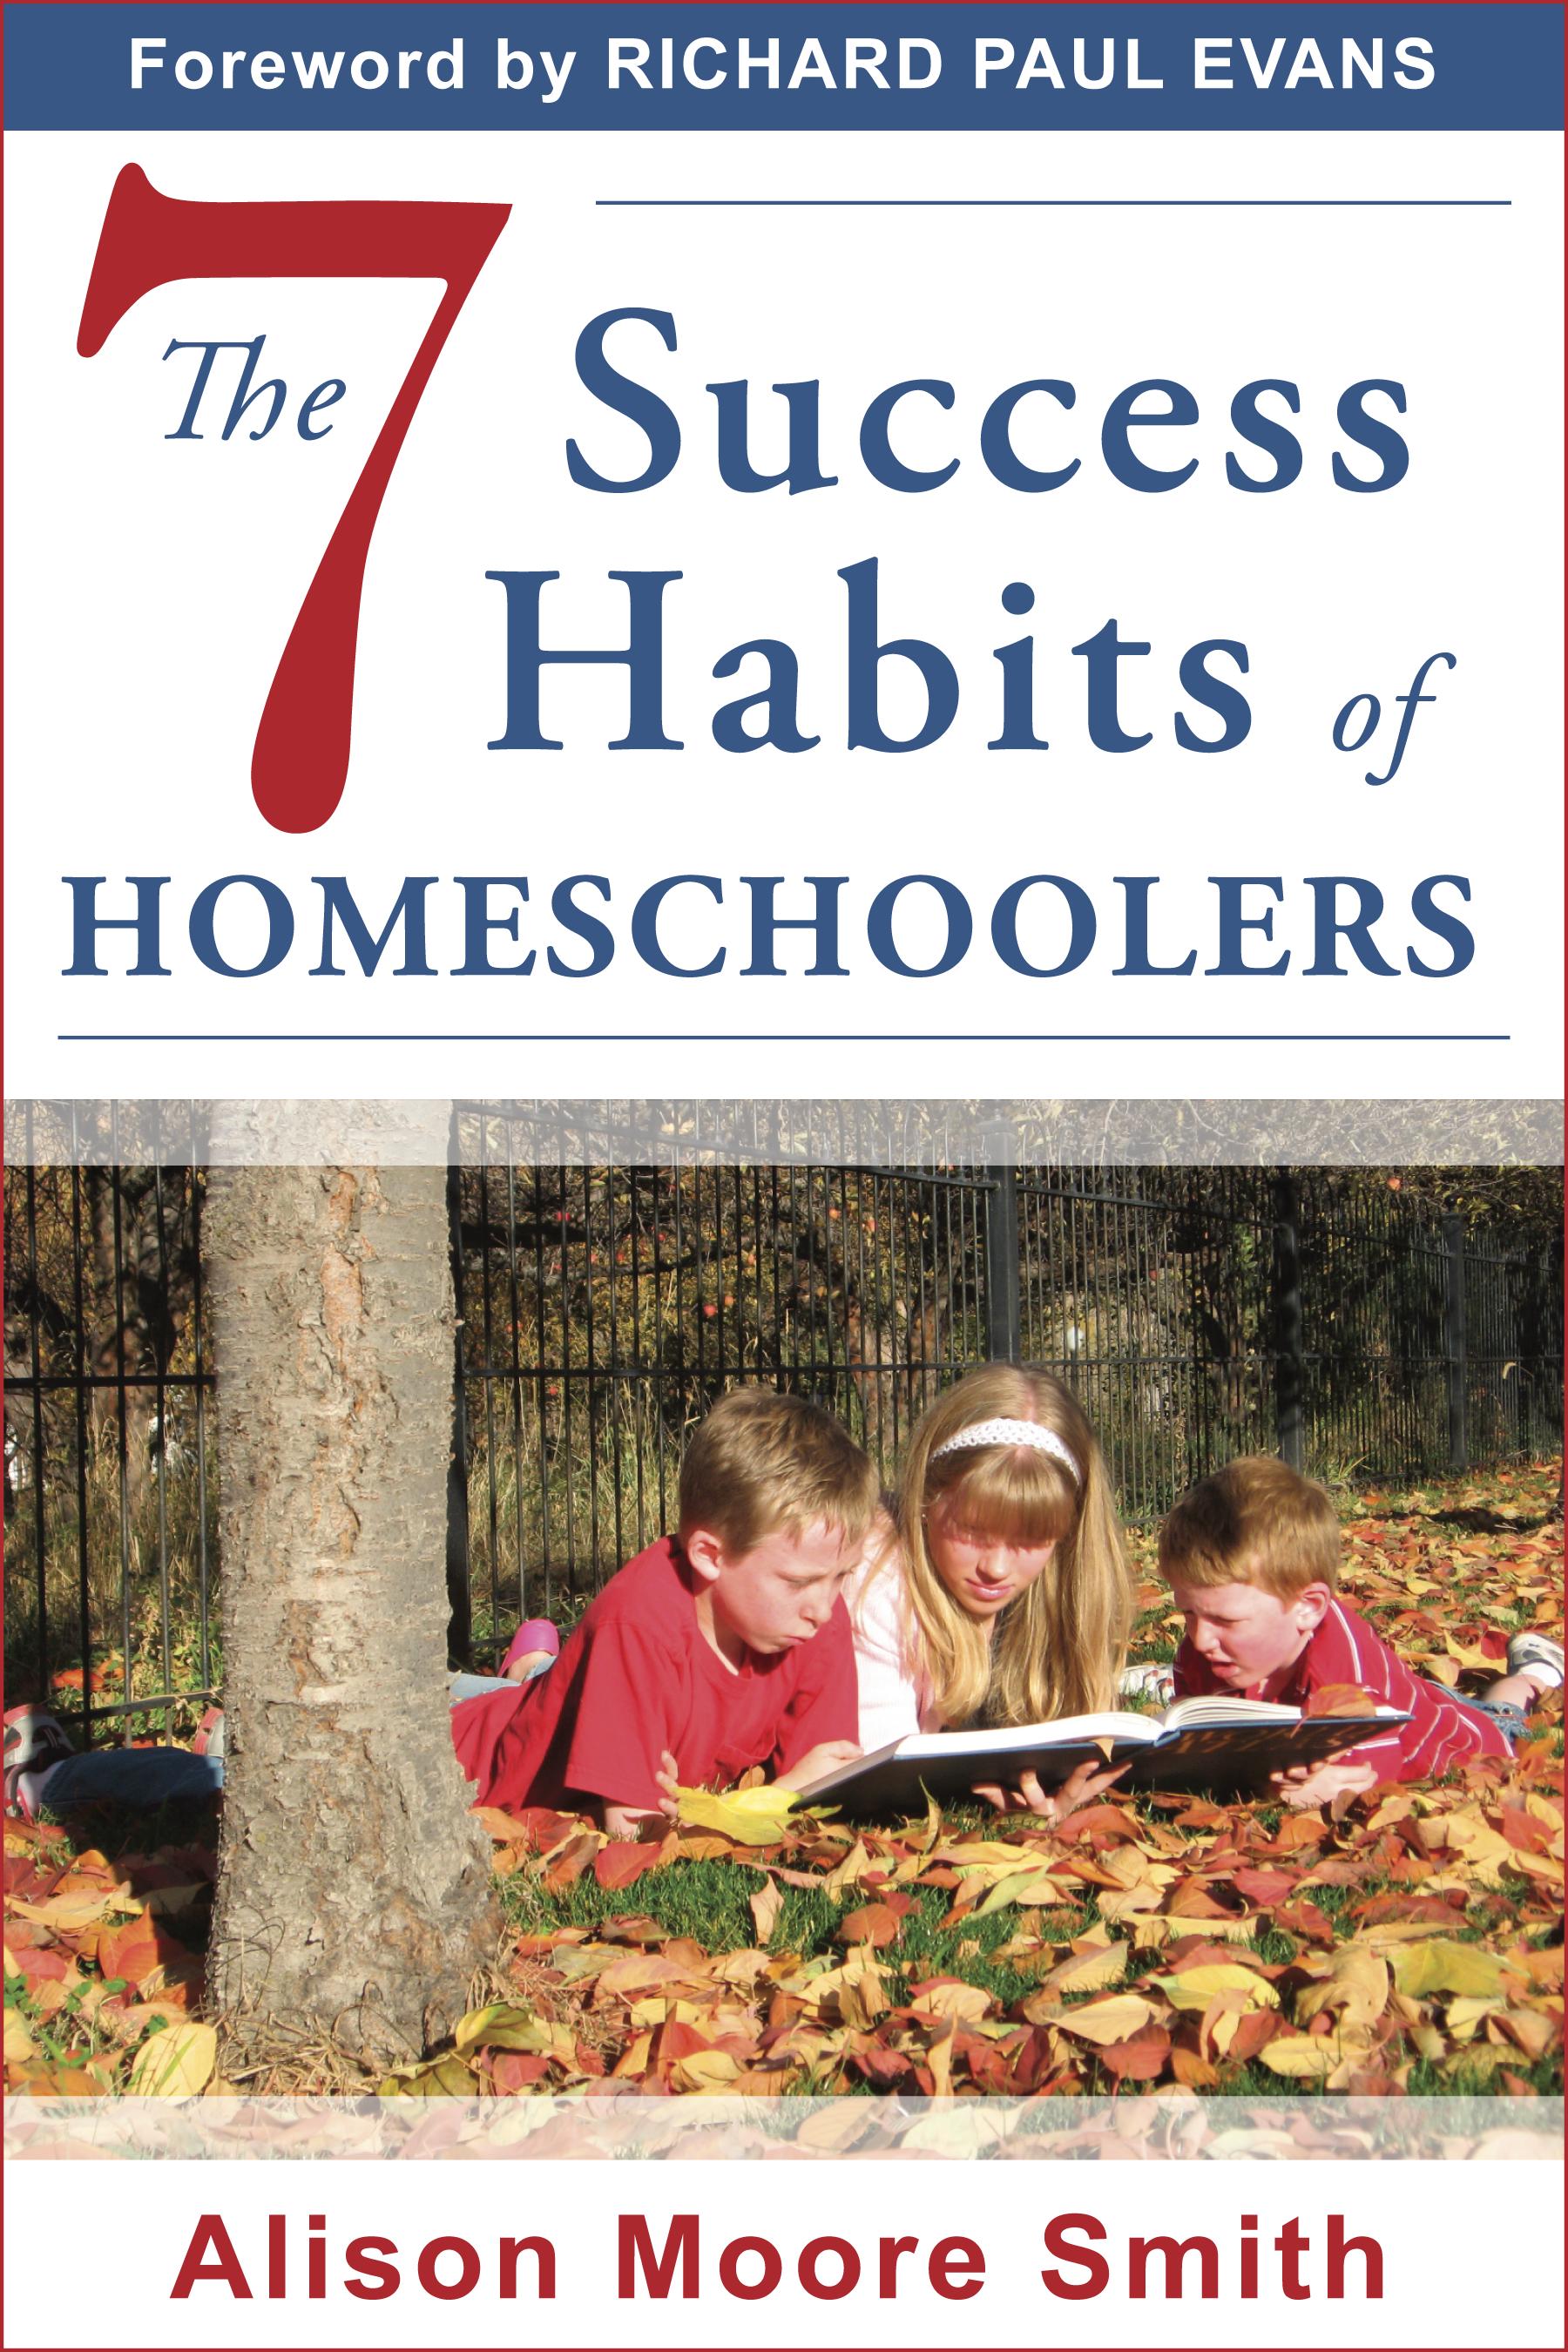 The 7 Success Habits of Homeschoolers